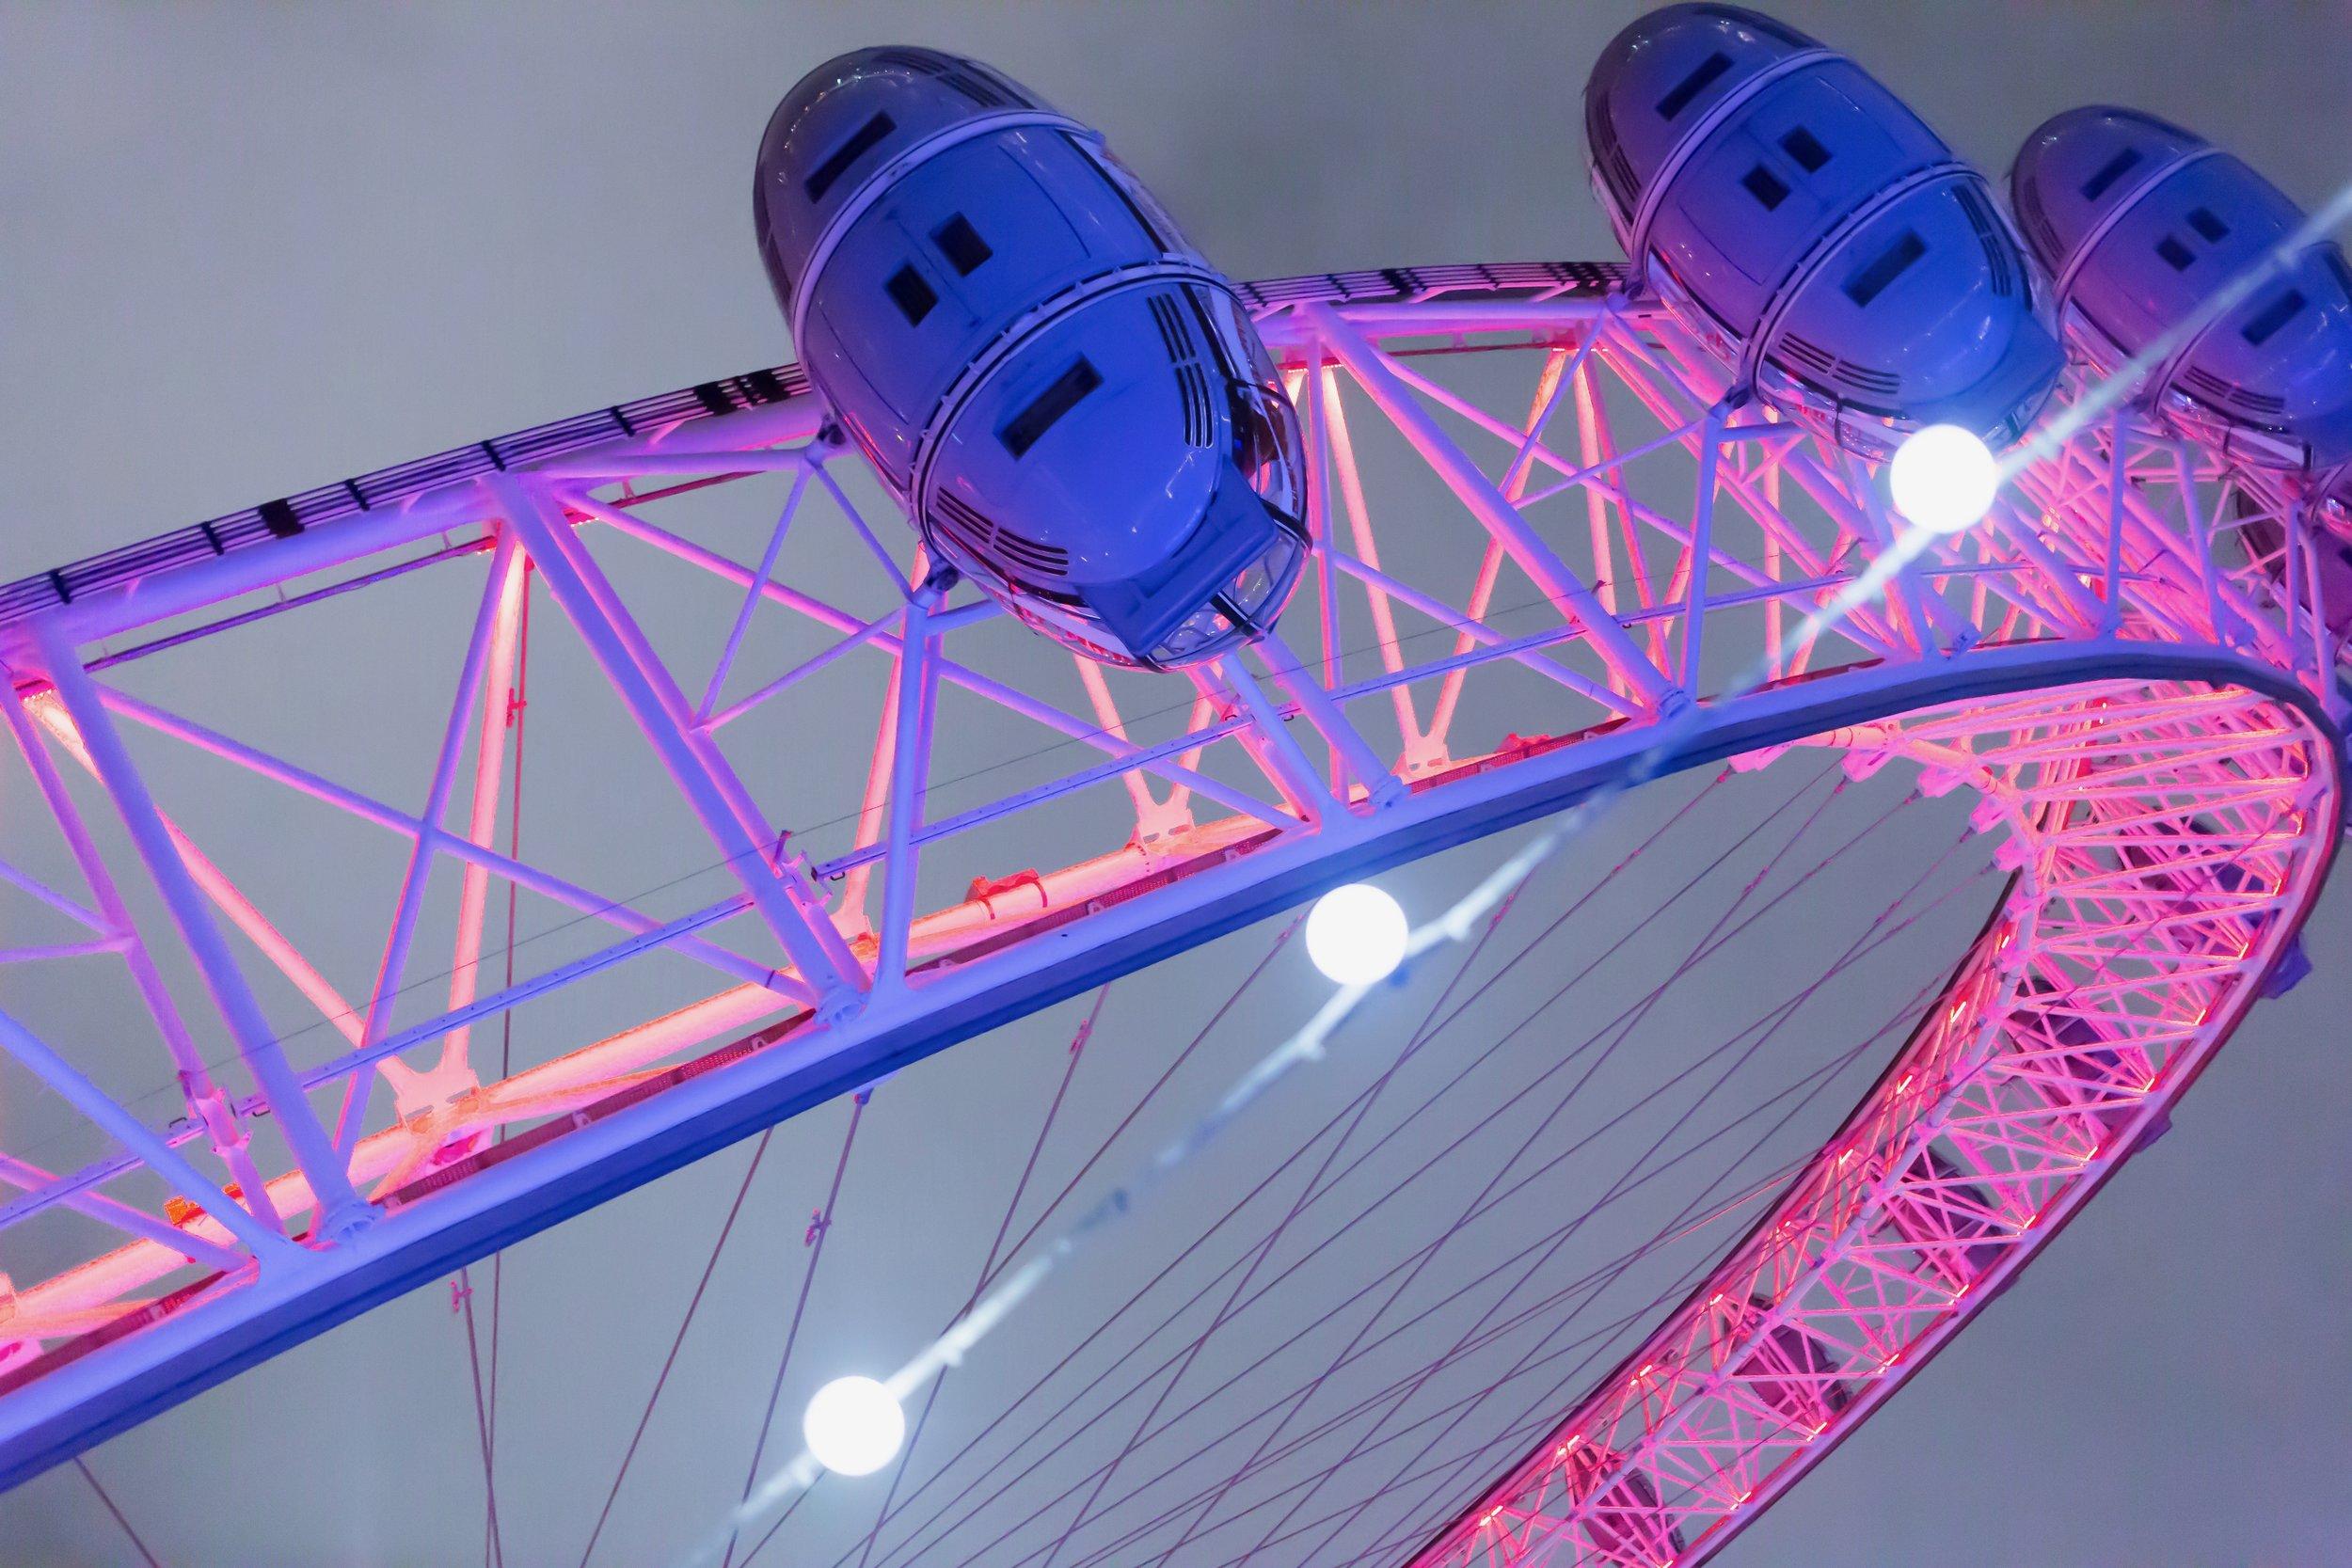 The London Eye, England